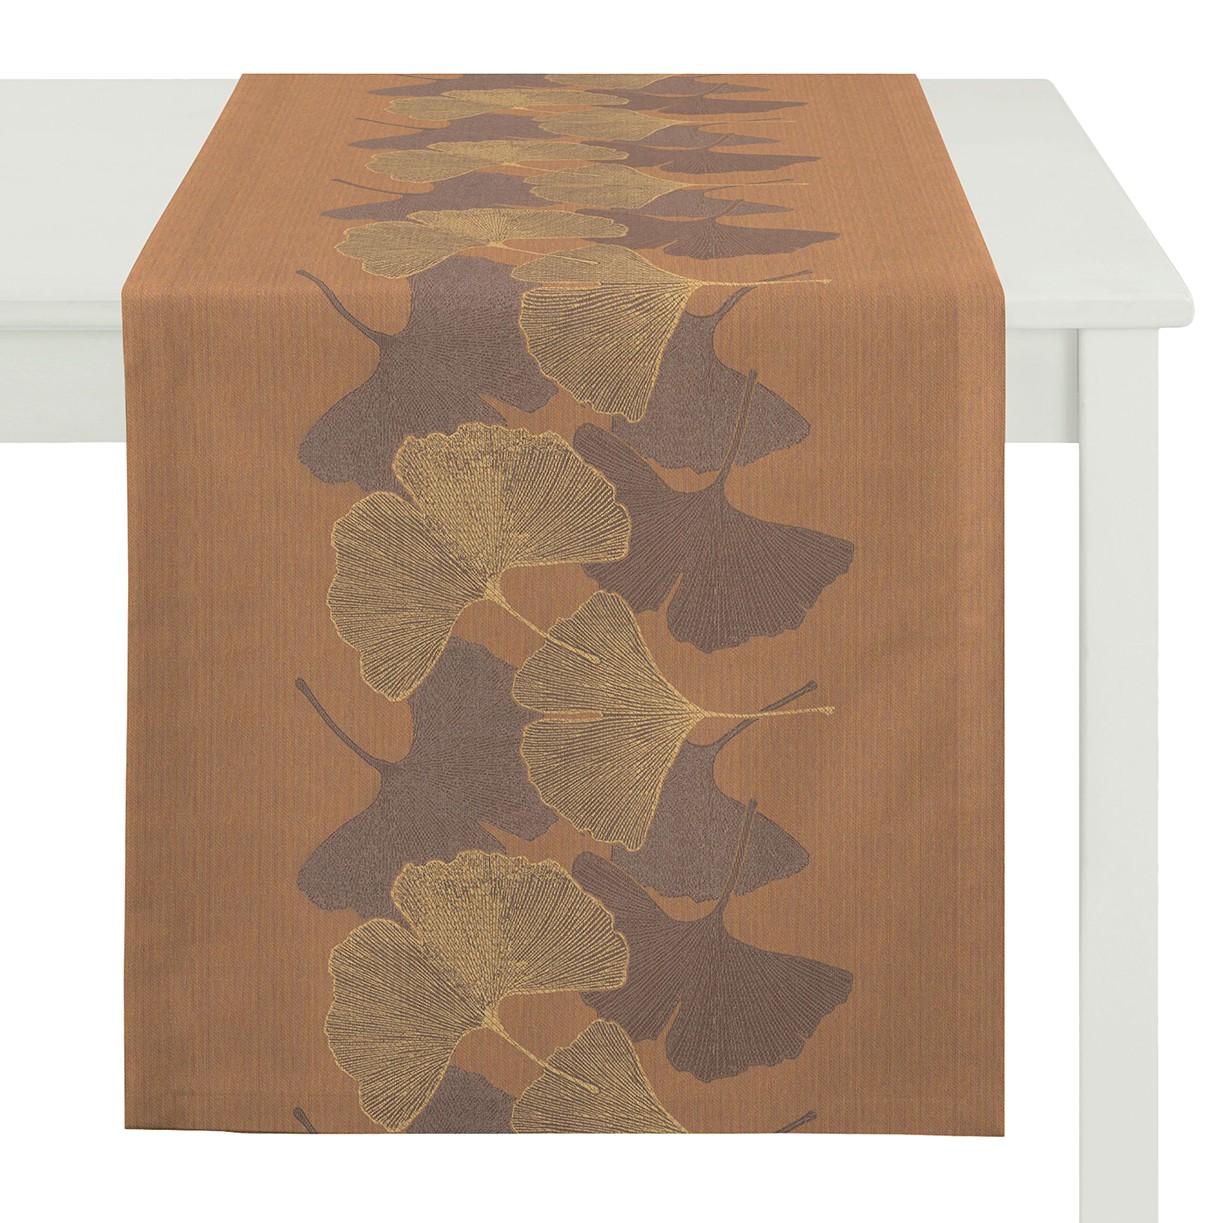 Tafelloper Undeloh - geweven stof - Zandkleurig, Apelt